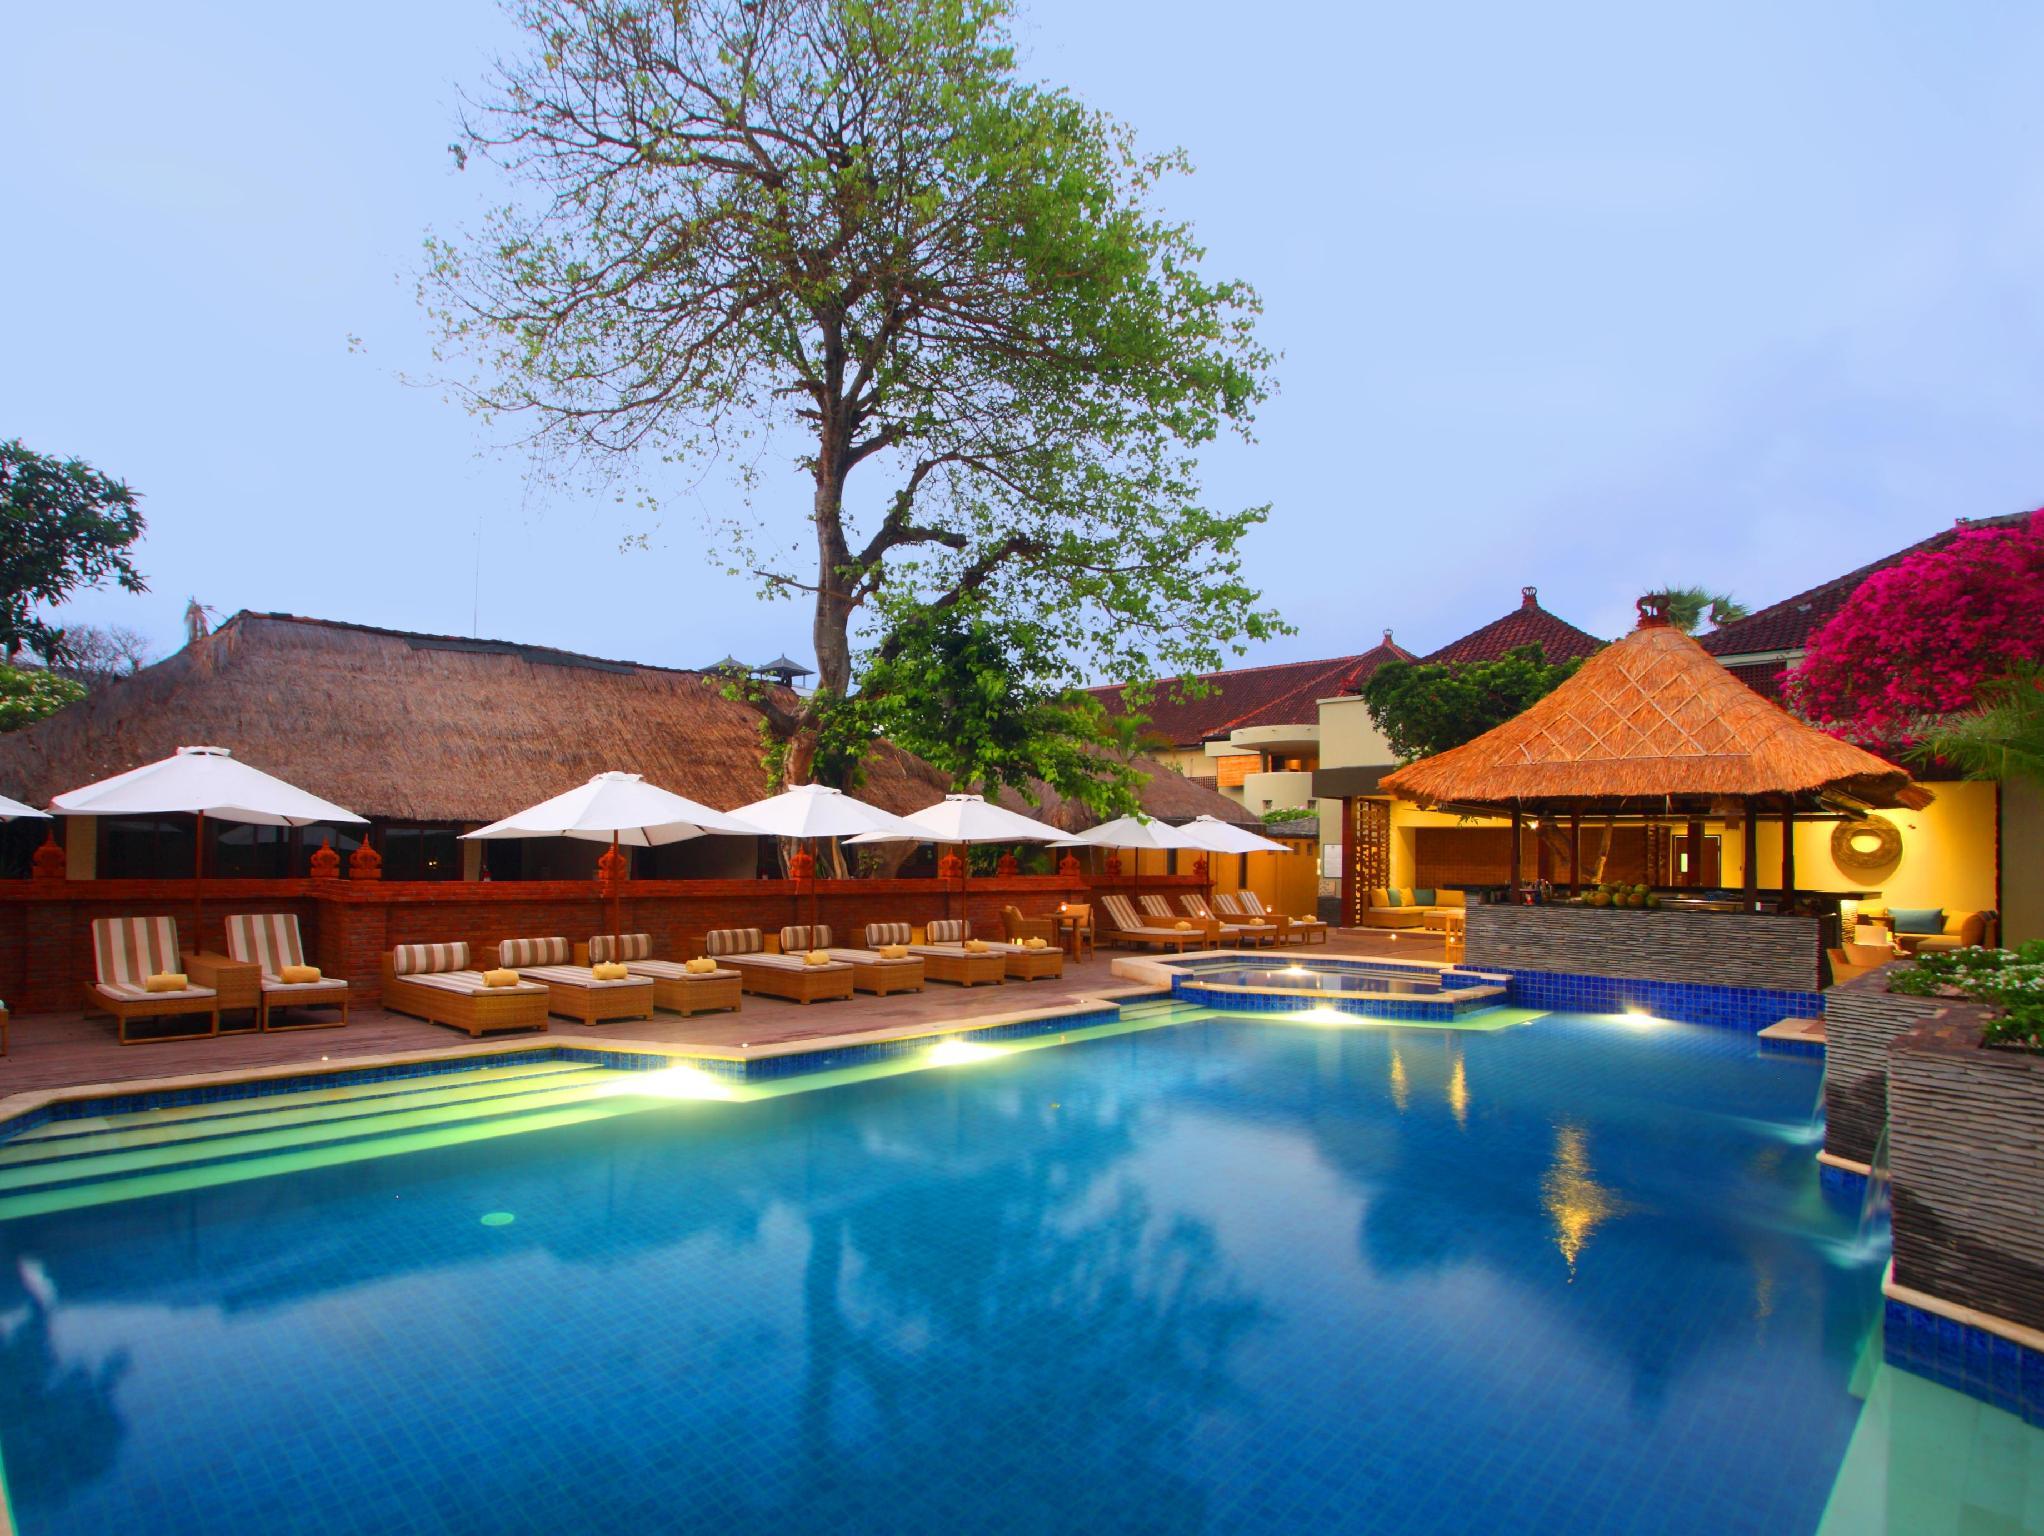 Alamkulkul boutique resort kuta bali indonesia great for Hip hotels bali